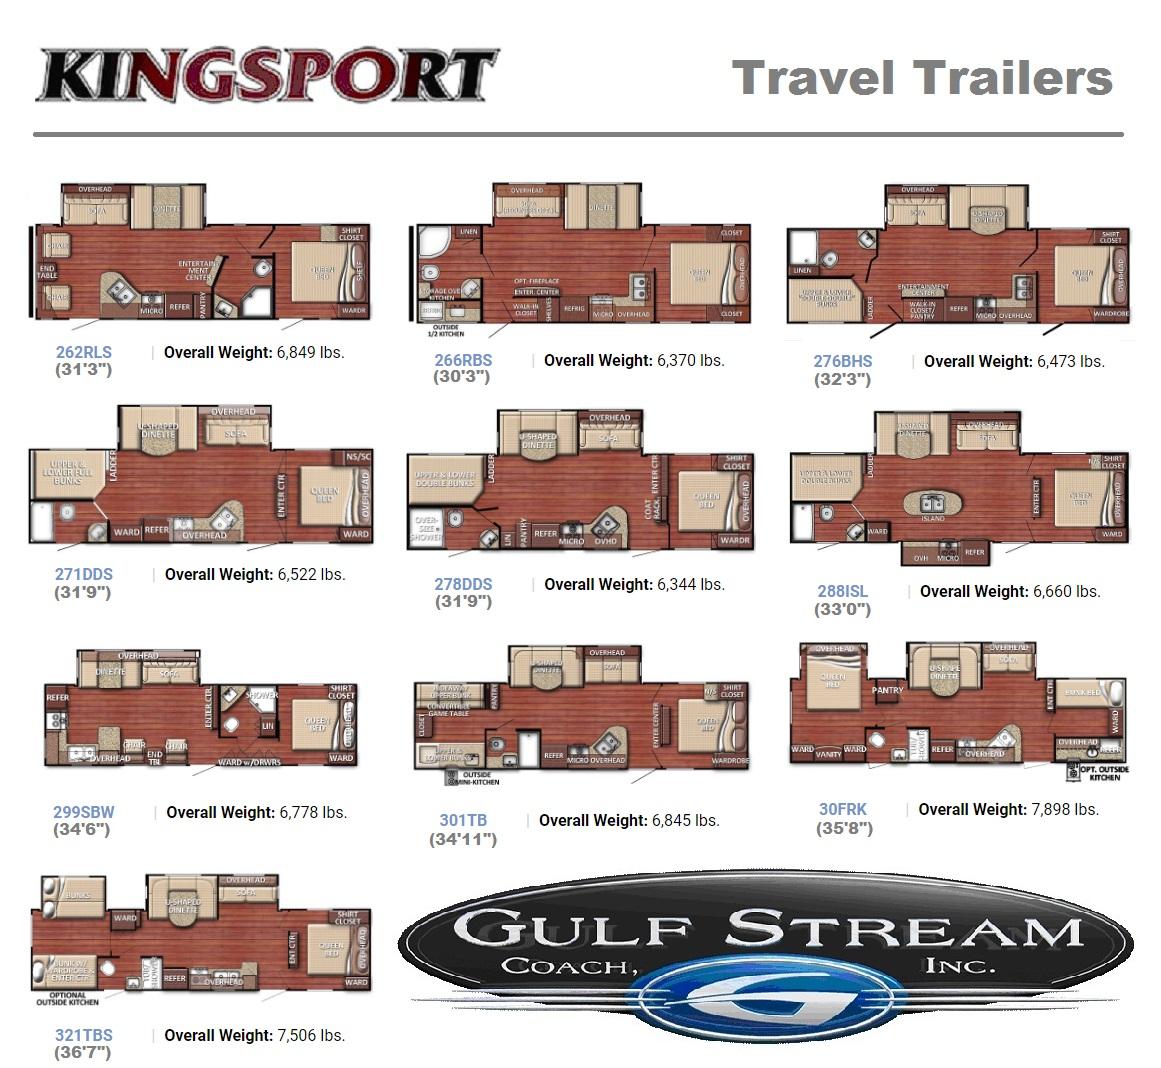 Kingsport floor plans